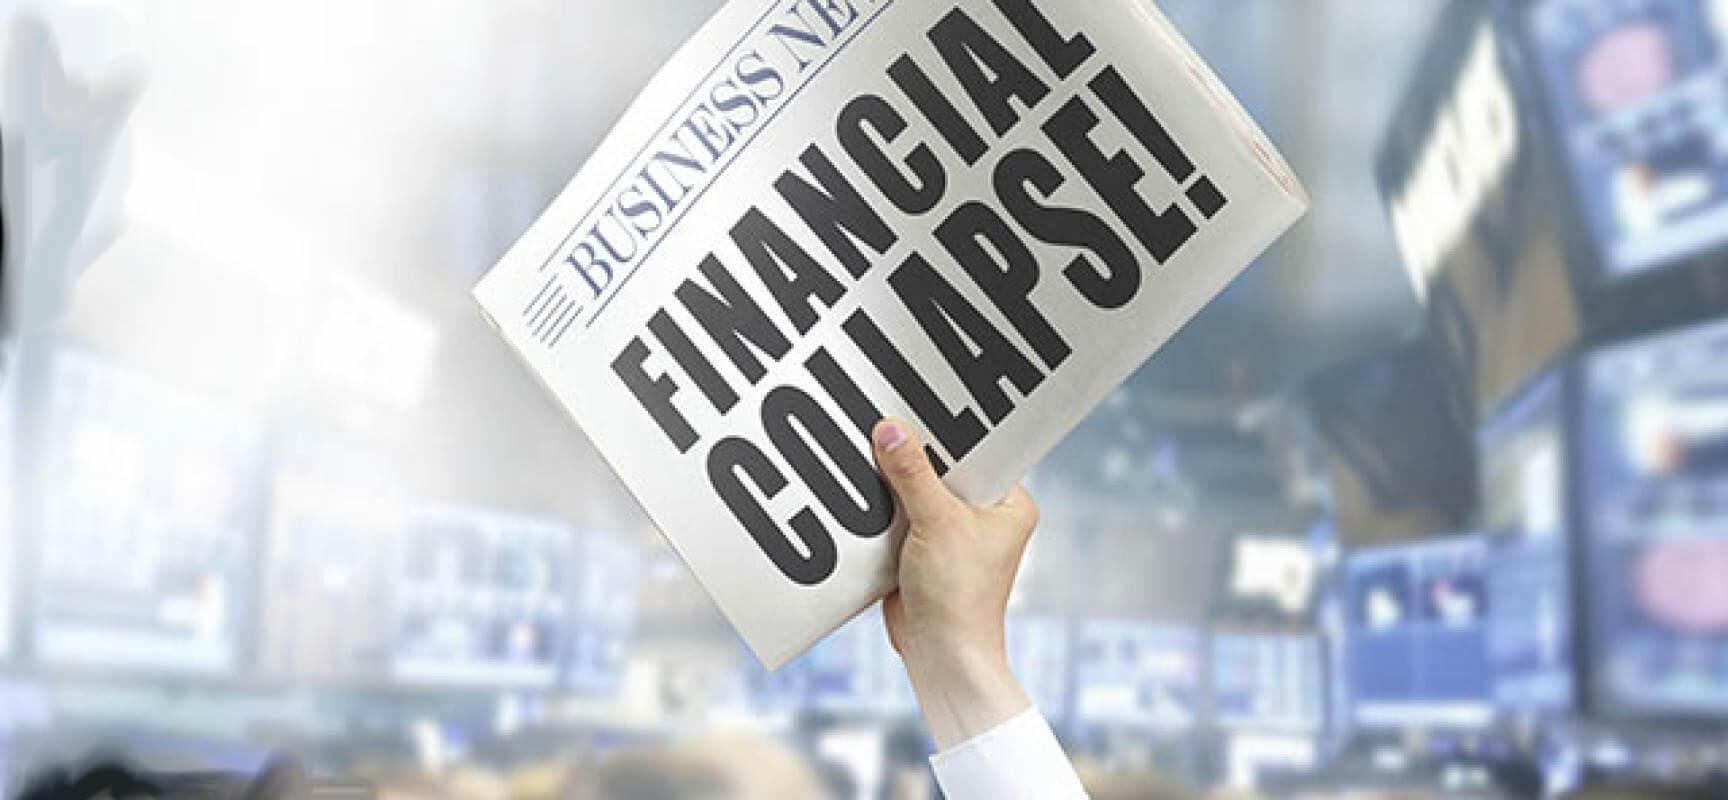 newspaper heralding FINANCIAL COLLAPSE